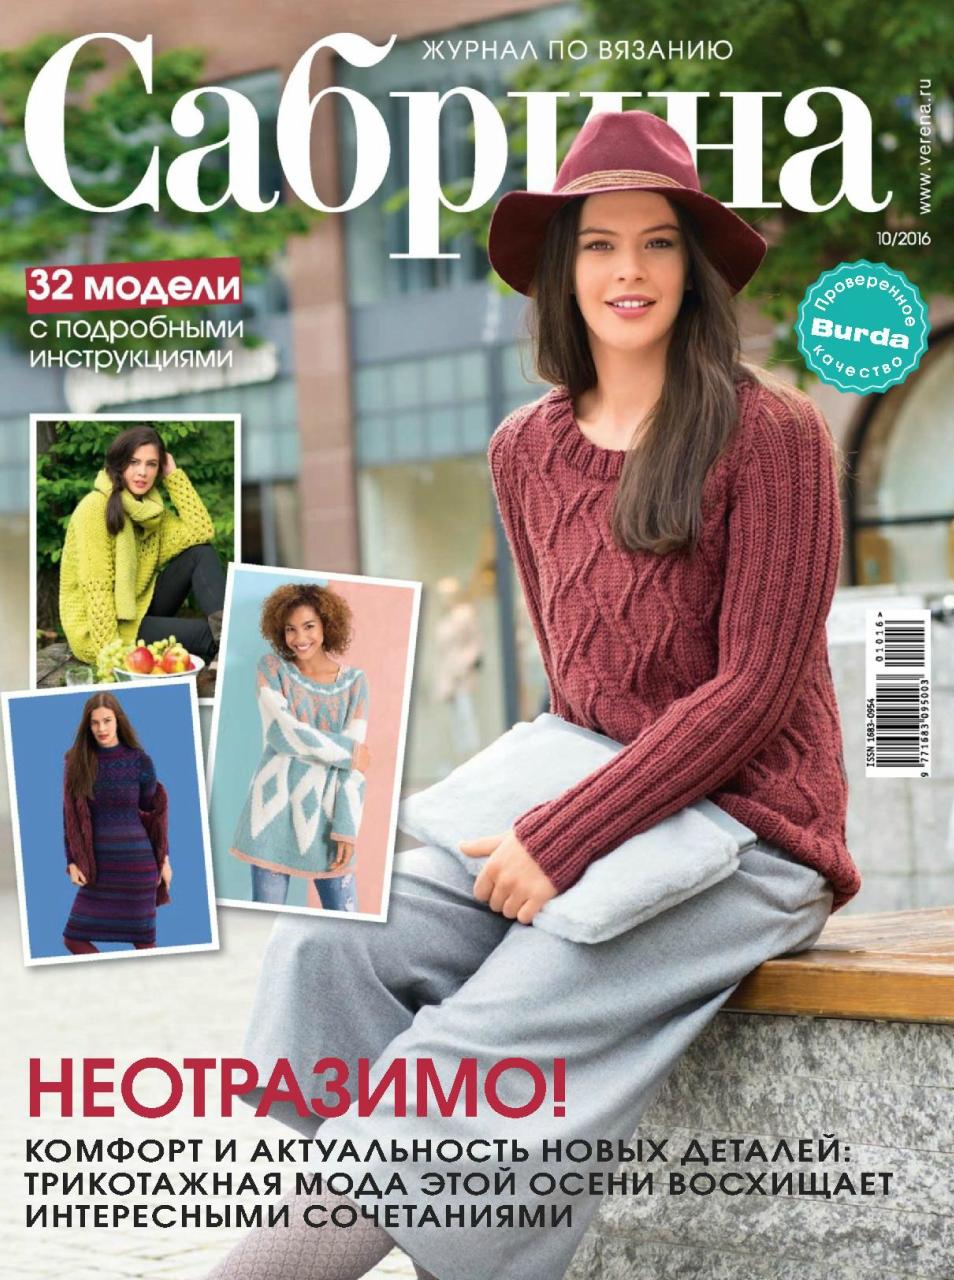 Журнал верена вязание спицами 2016 со схемами фото 64